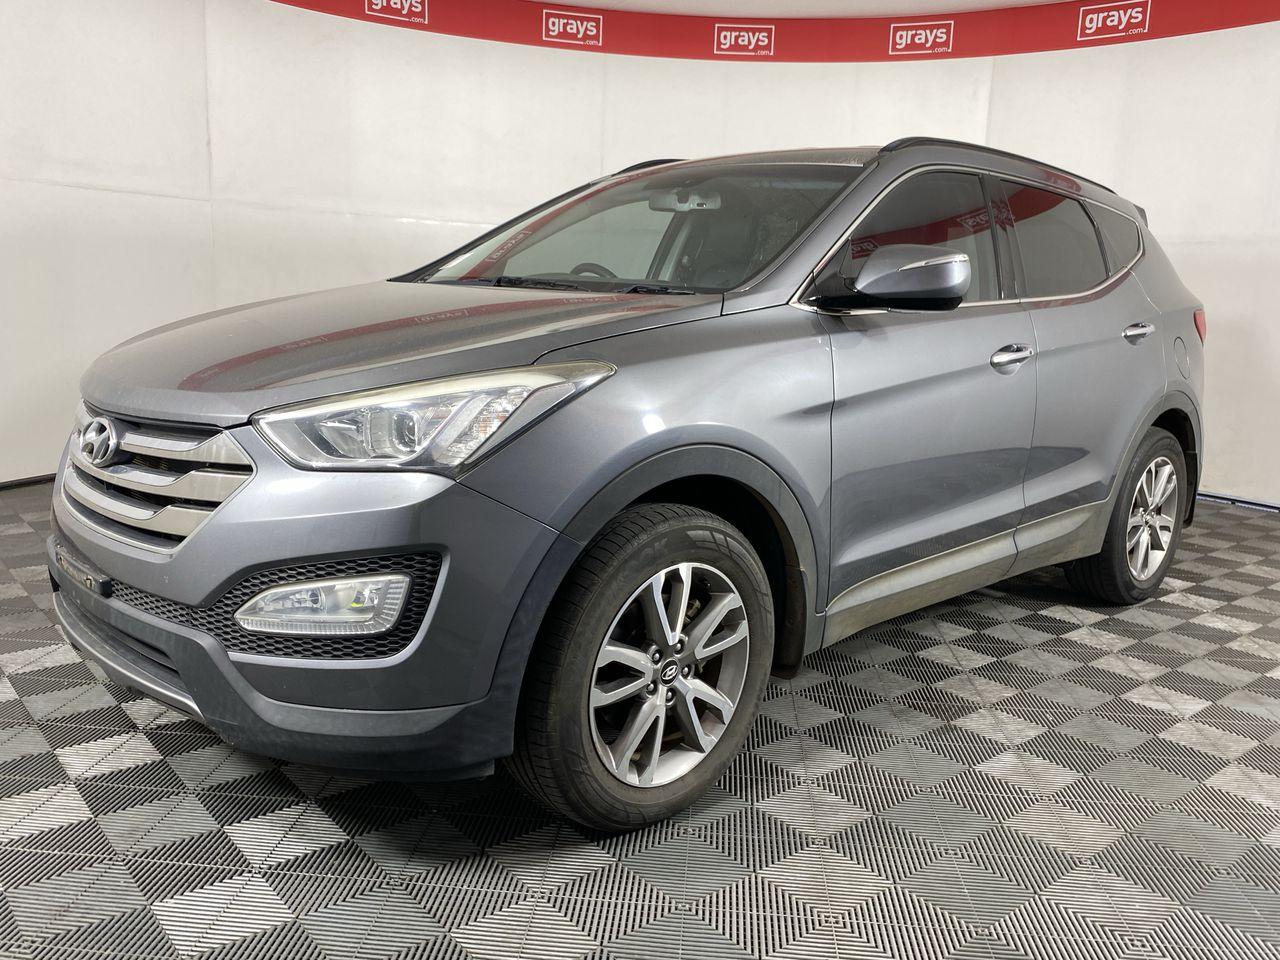 2012 Hyundai Santa Fe Elite DM Turbo Diesel Automatic 7 Seats Wagon